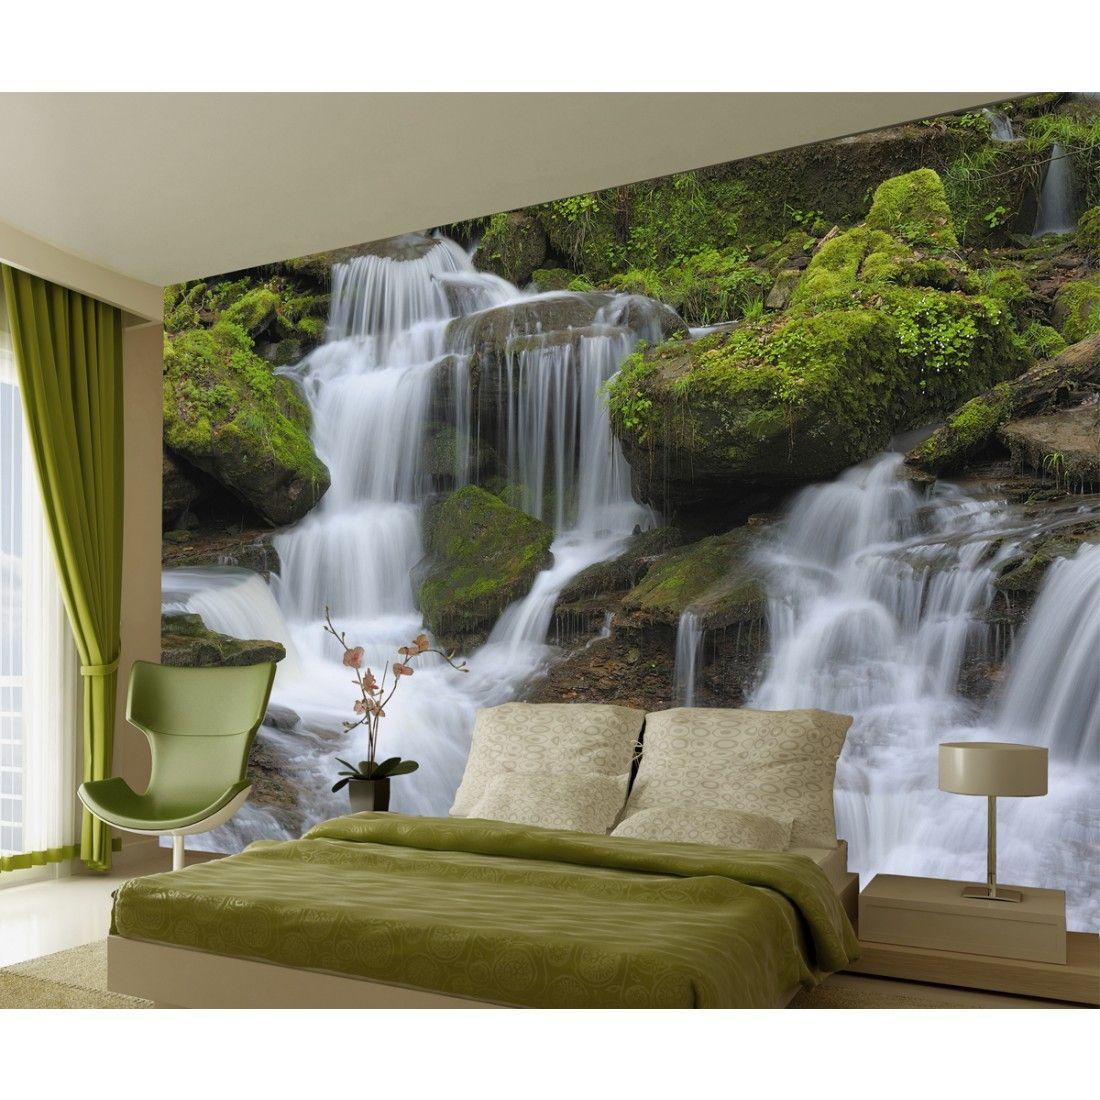 waterfall wall mural w4p waterfall 001 projects pinterest waterfall wall mural w4p waterfall 001